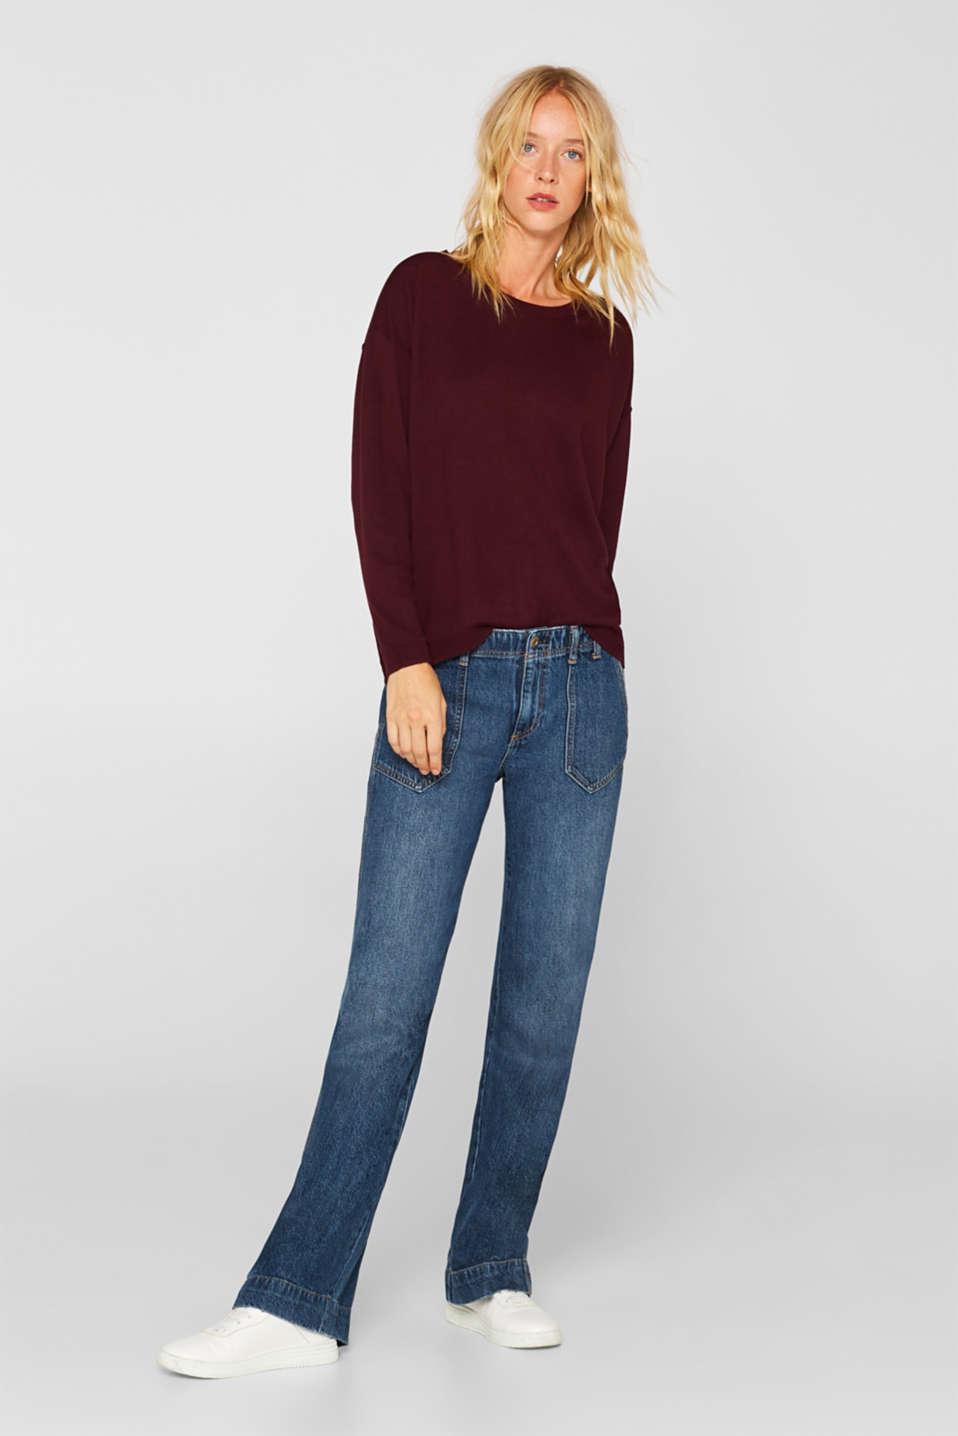 Fine knit jumper with on-trend details, BORDEAUX RED, detail image number 1